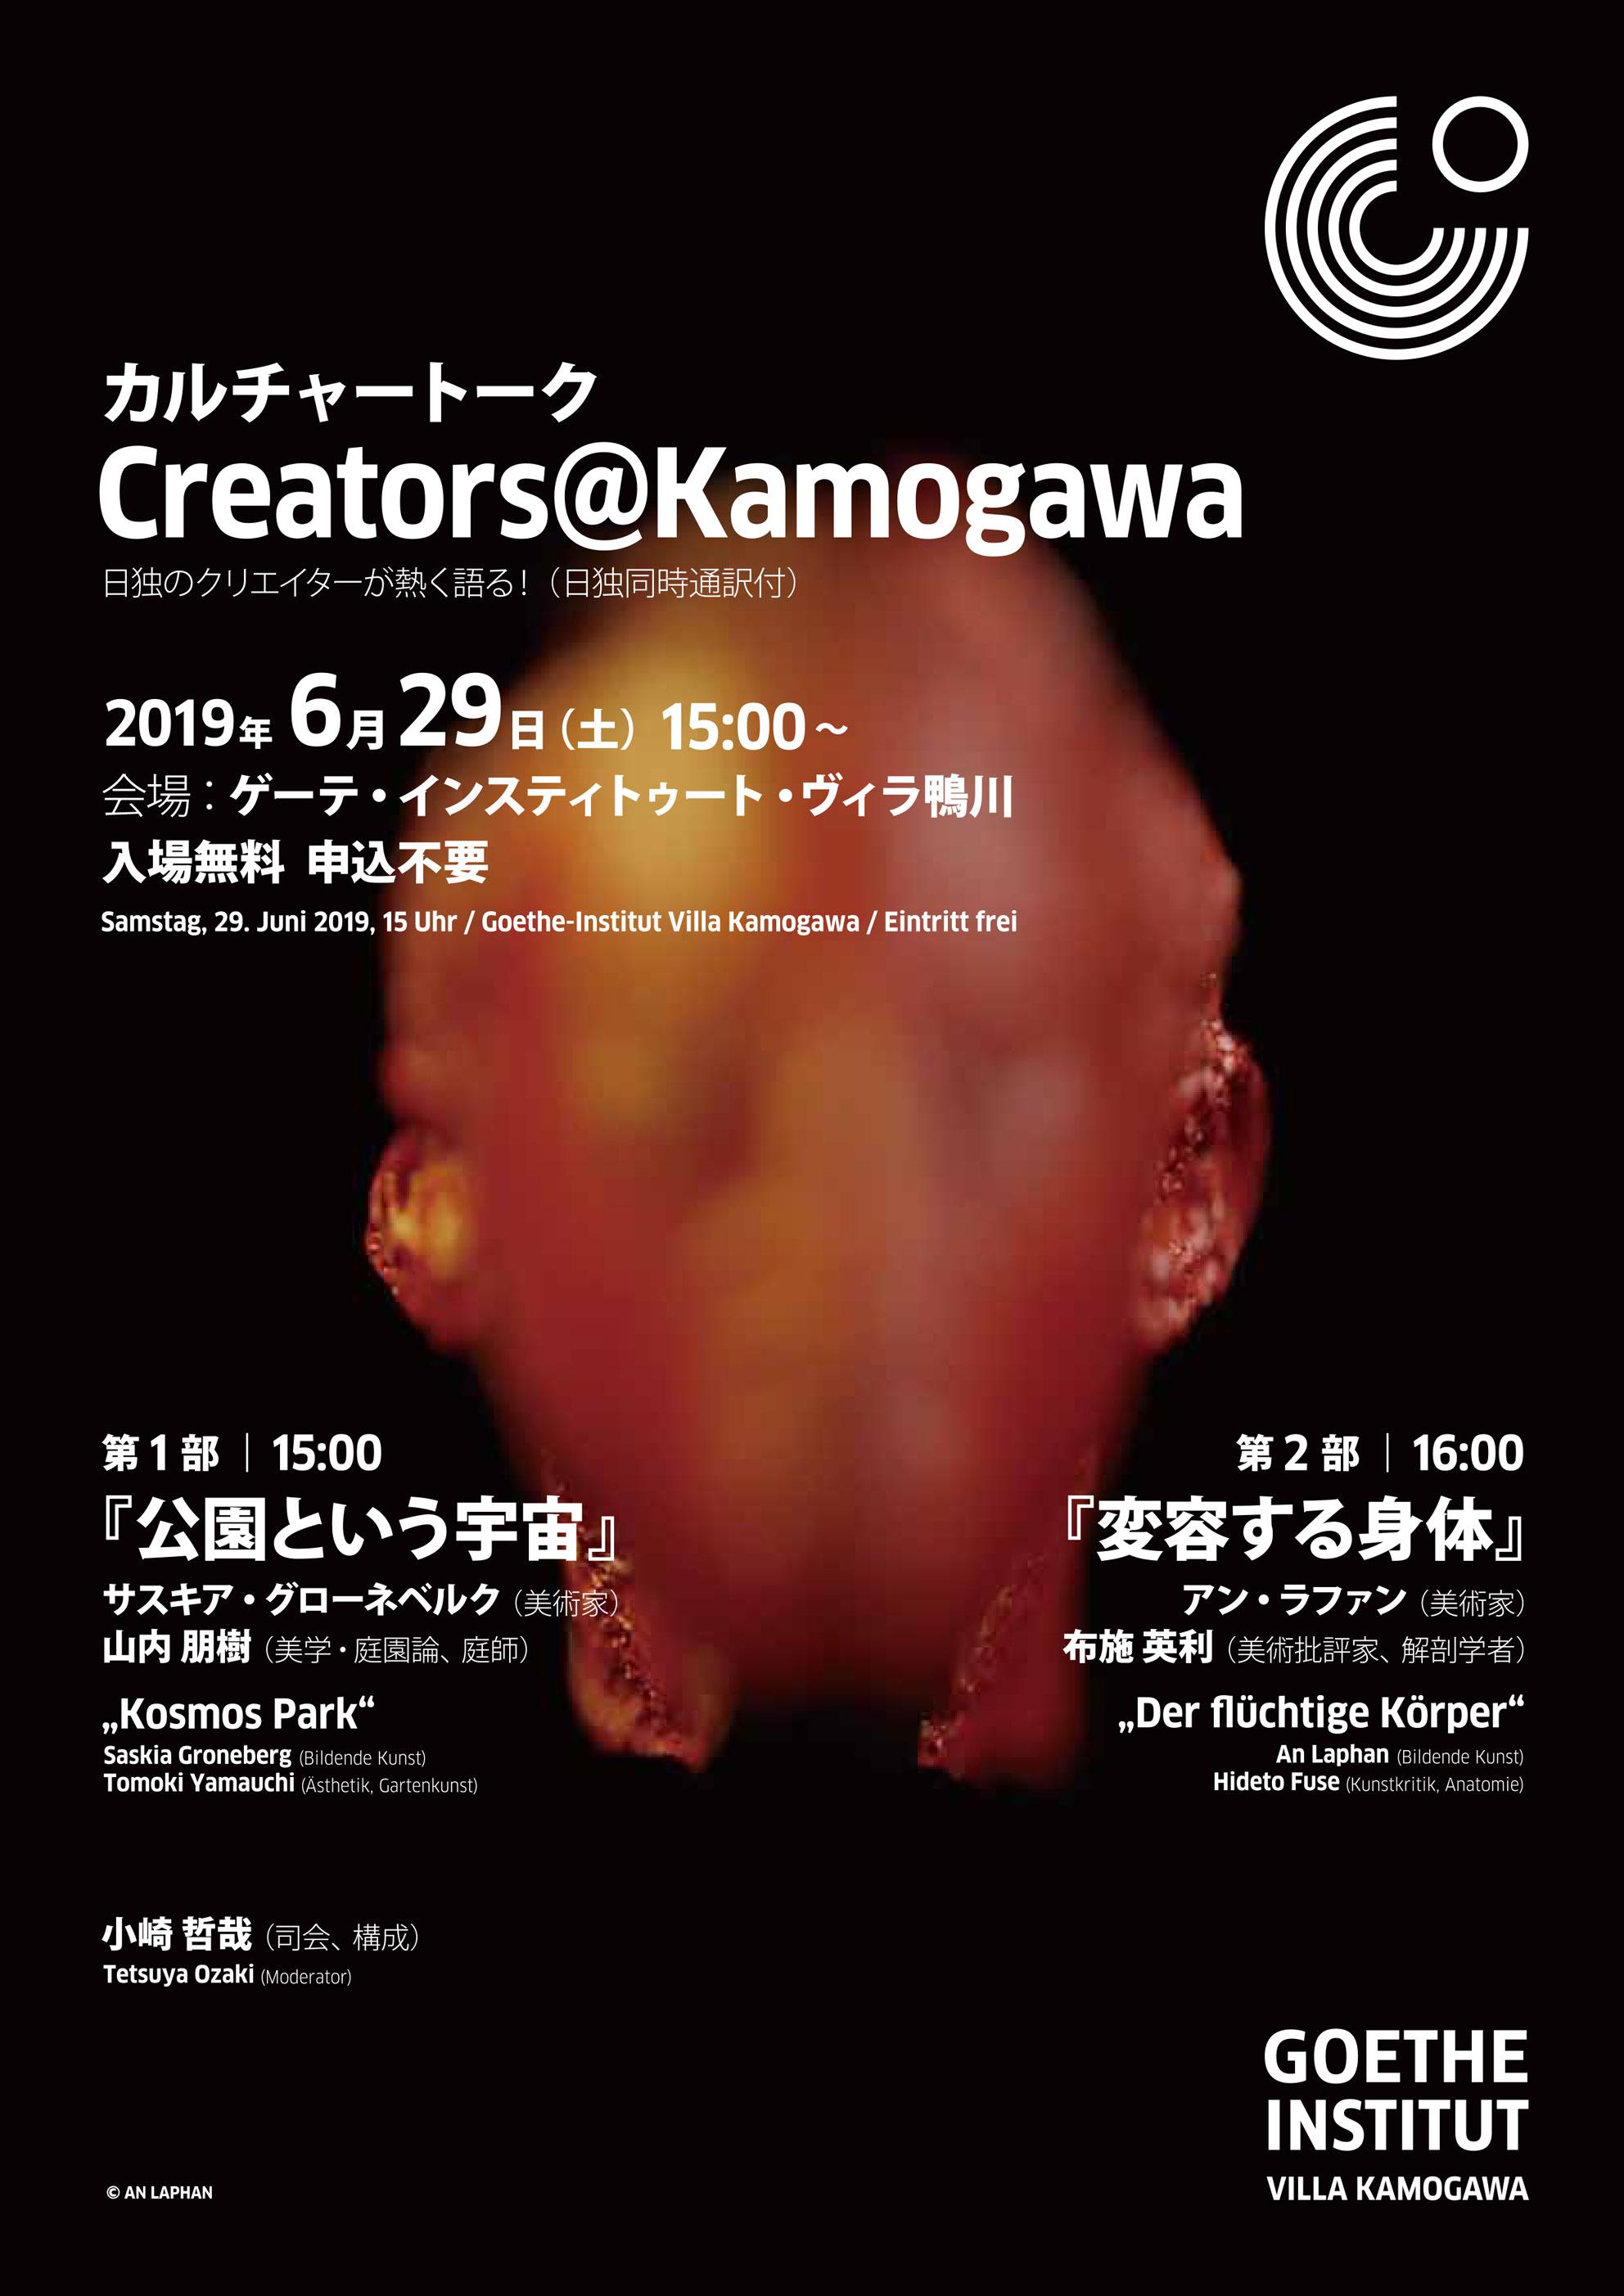 Goethe-Institut Creators@Kamogawa, Jun 29 2019